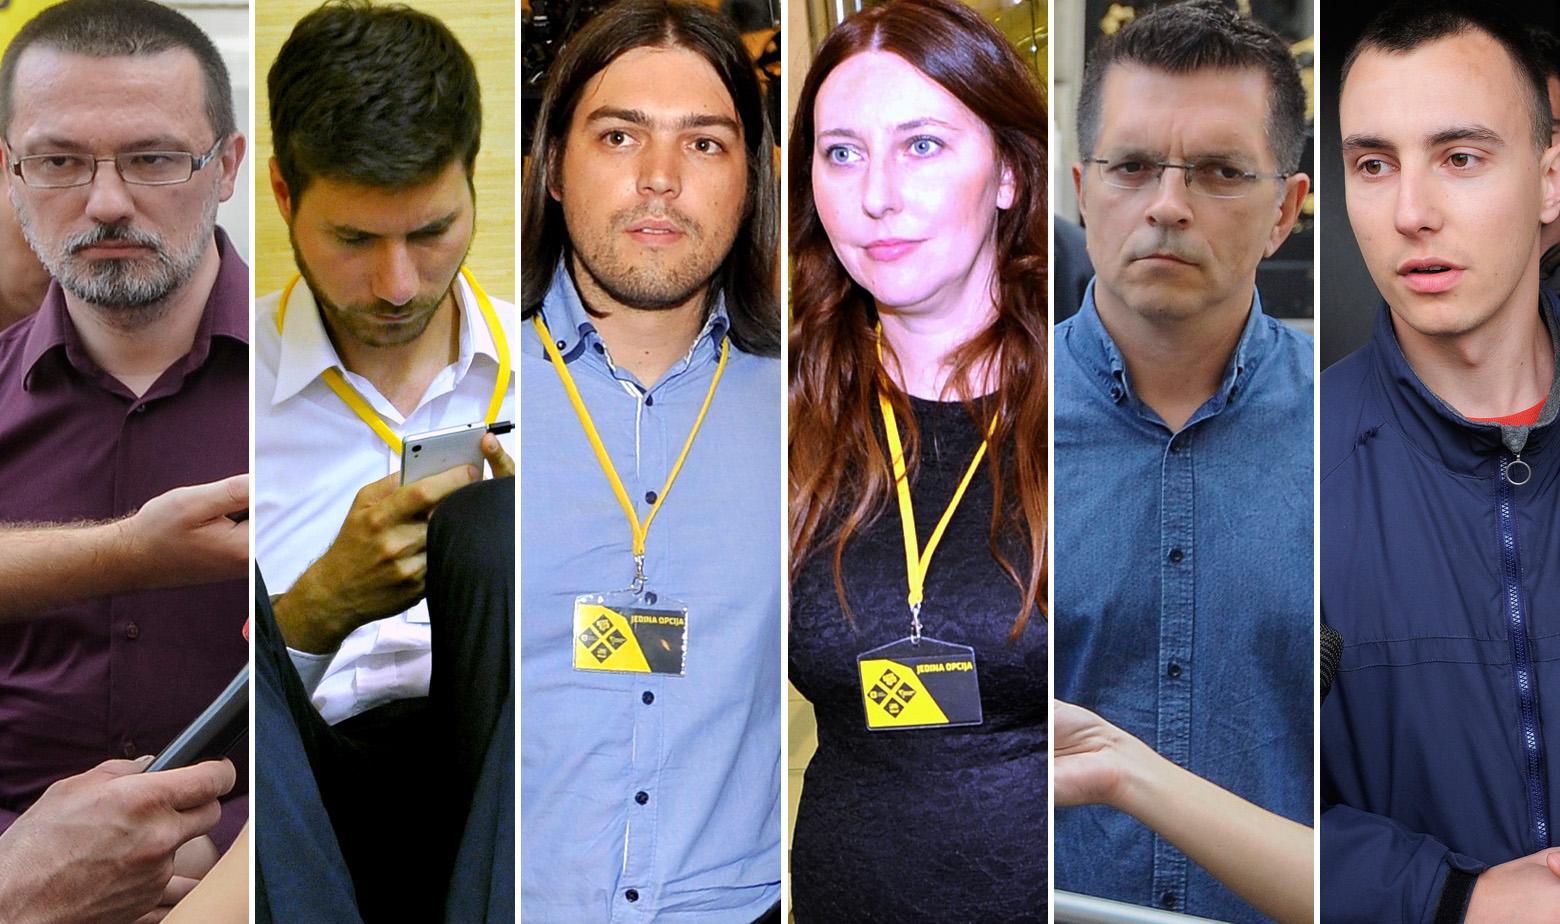 S lijeva na desno: Hrvoje Runtić, Ivan Pernar, Ivan Vilibor Sinčić, Vladimira Palfi, Branimir Bunjac, Marin Škibola